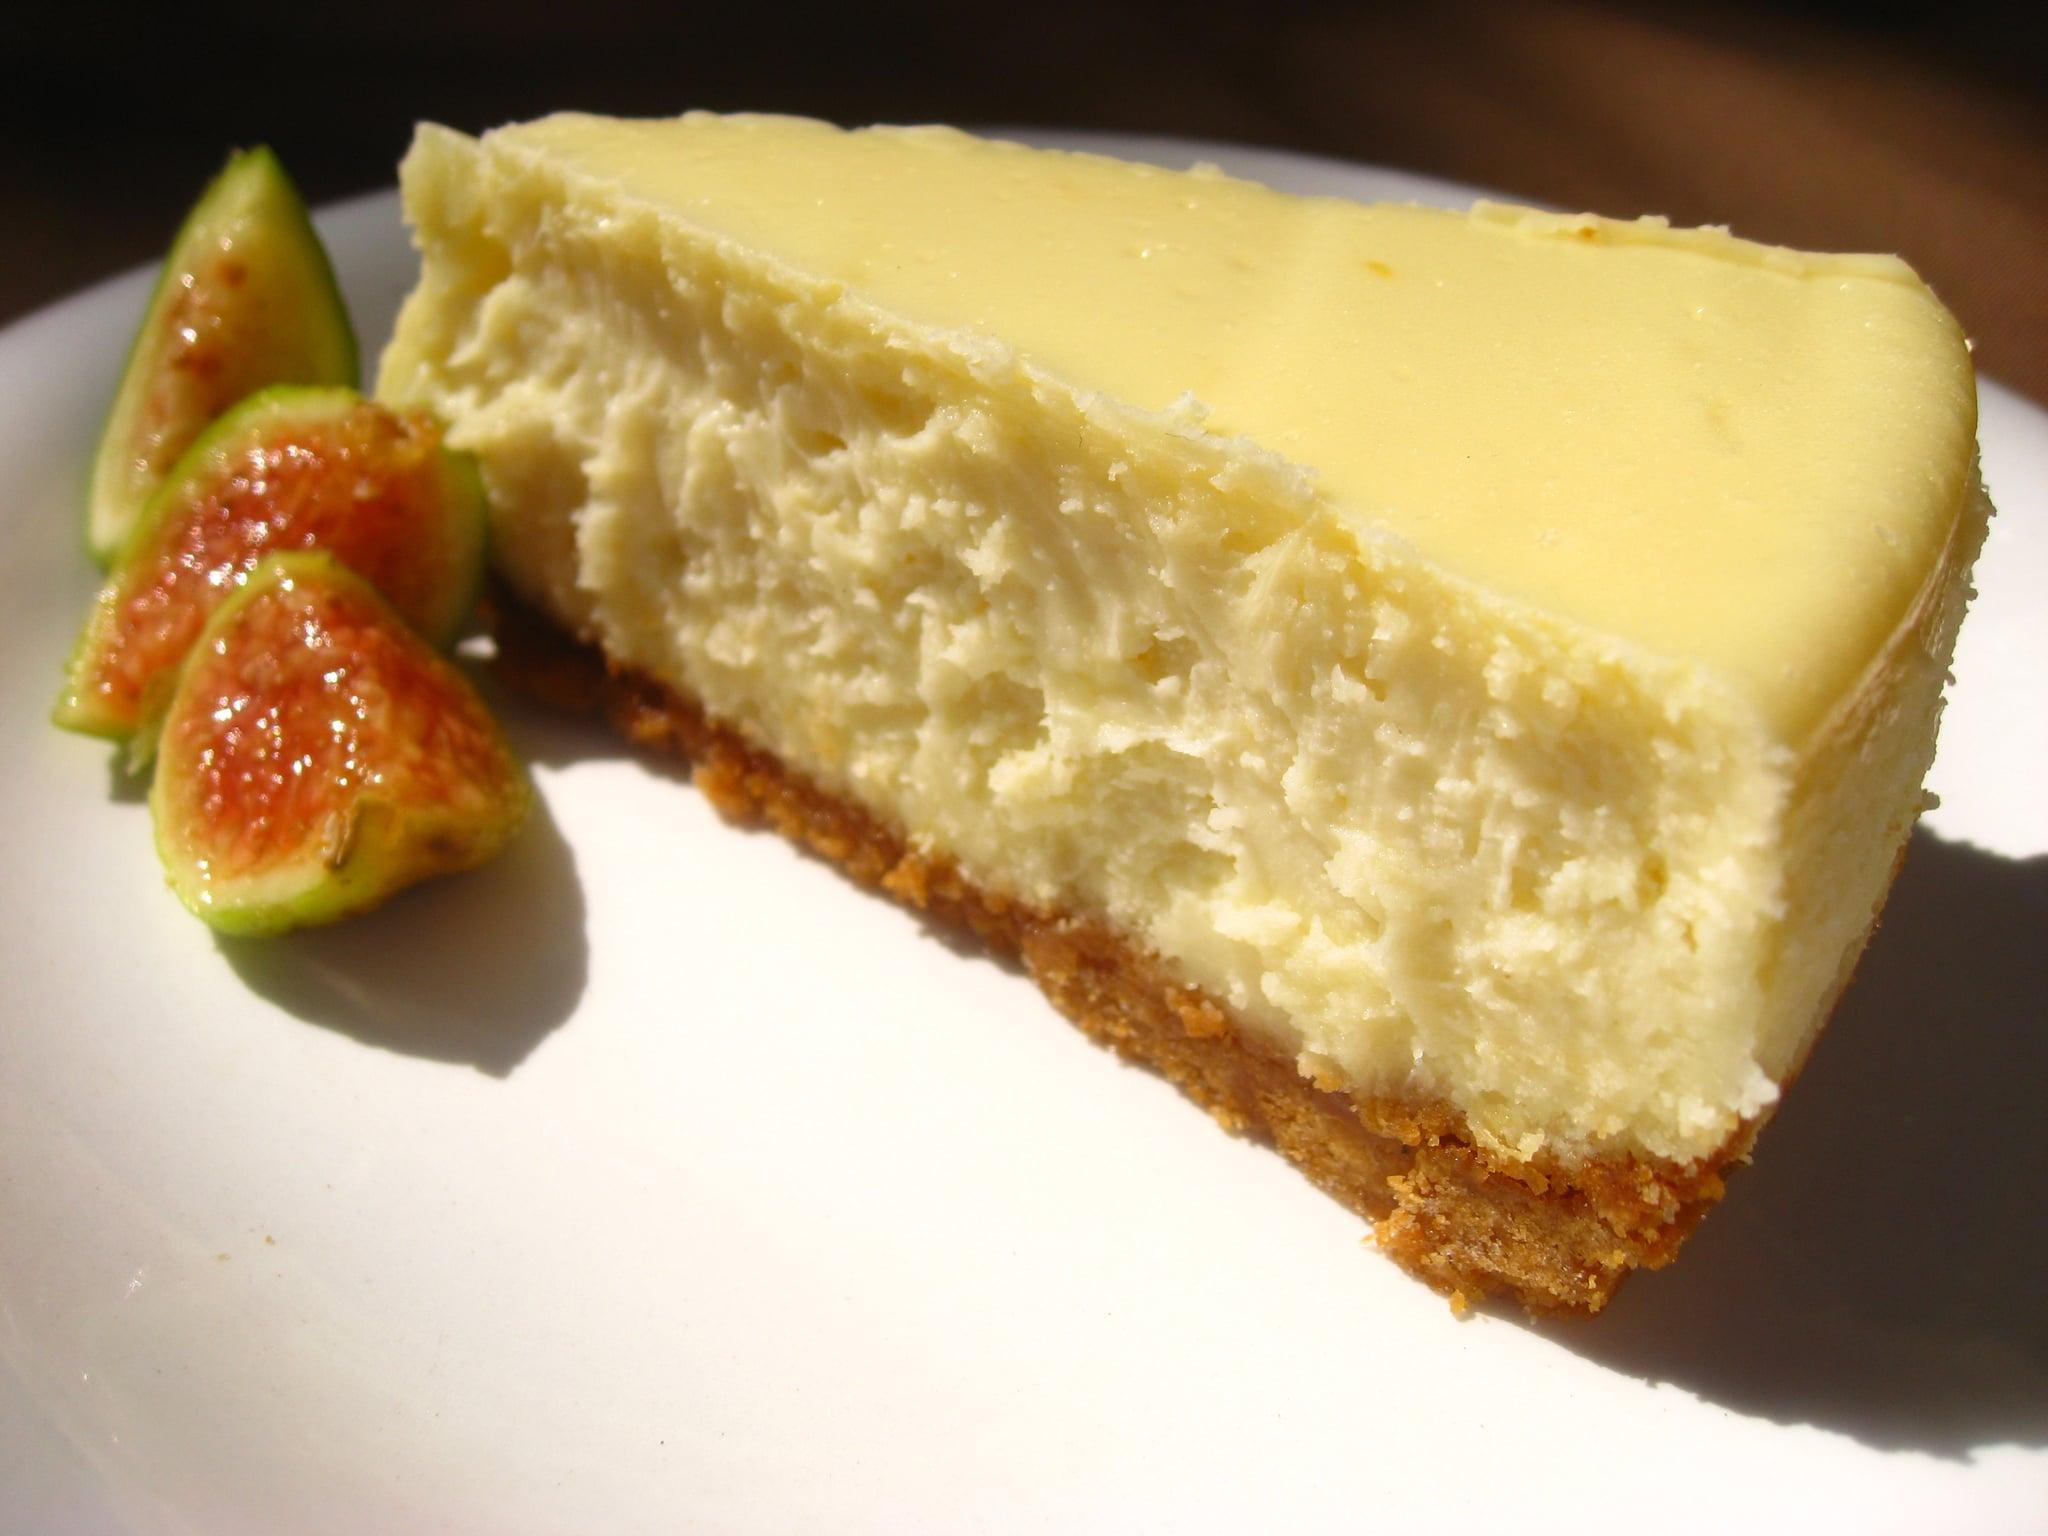 Goat Cheese Cheesecake 52 weeks of baking: lemon goat cheese cheesecake | popsugar food